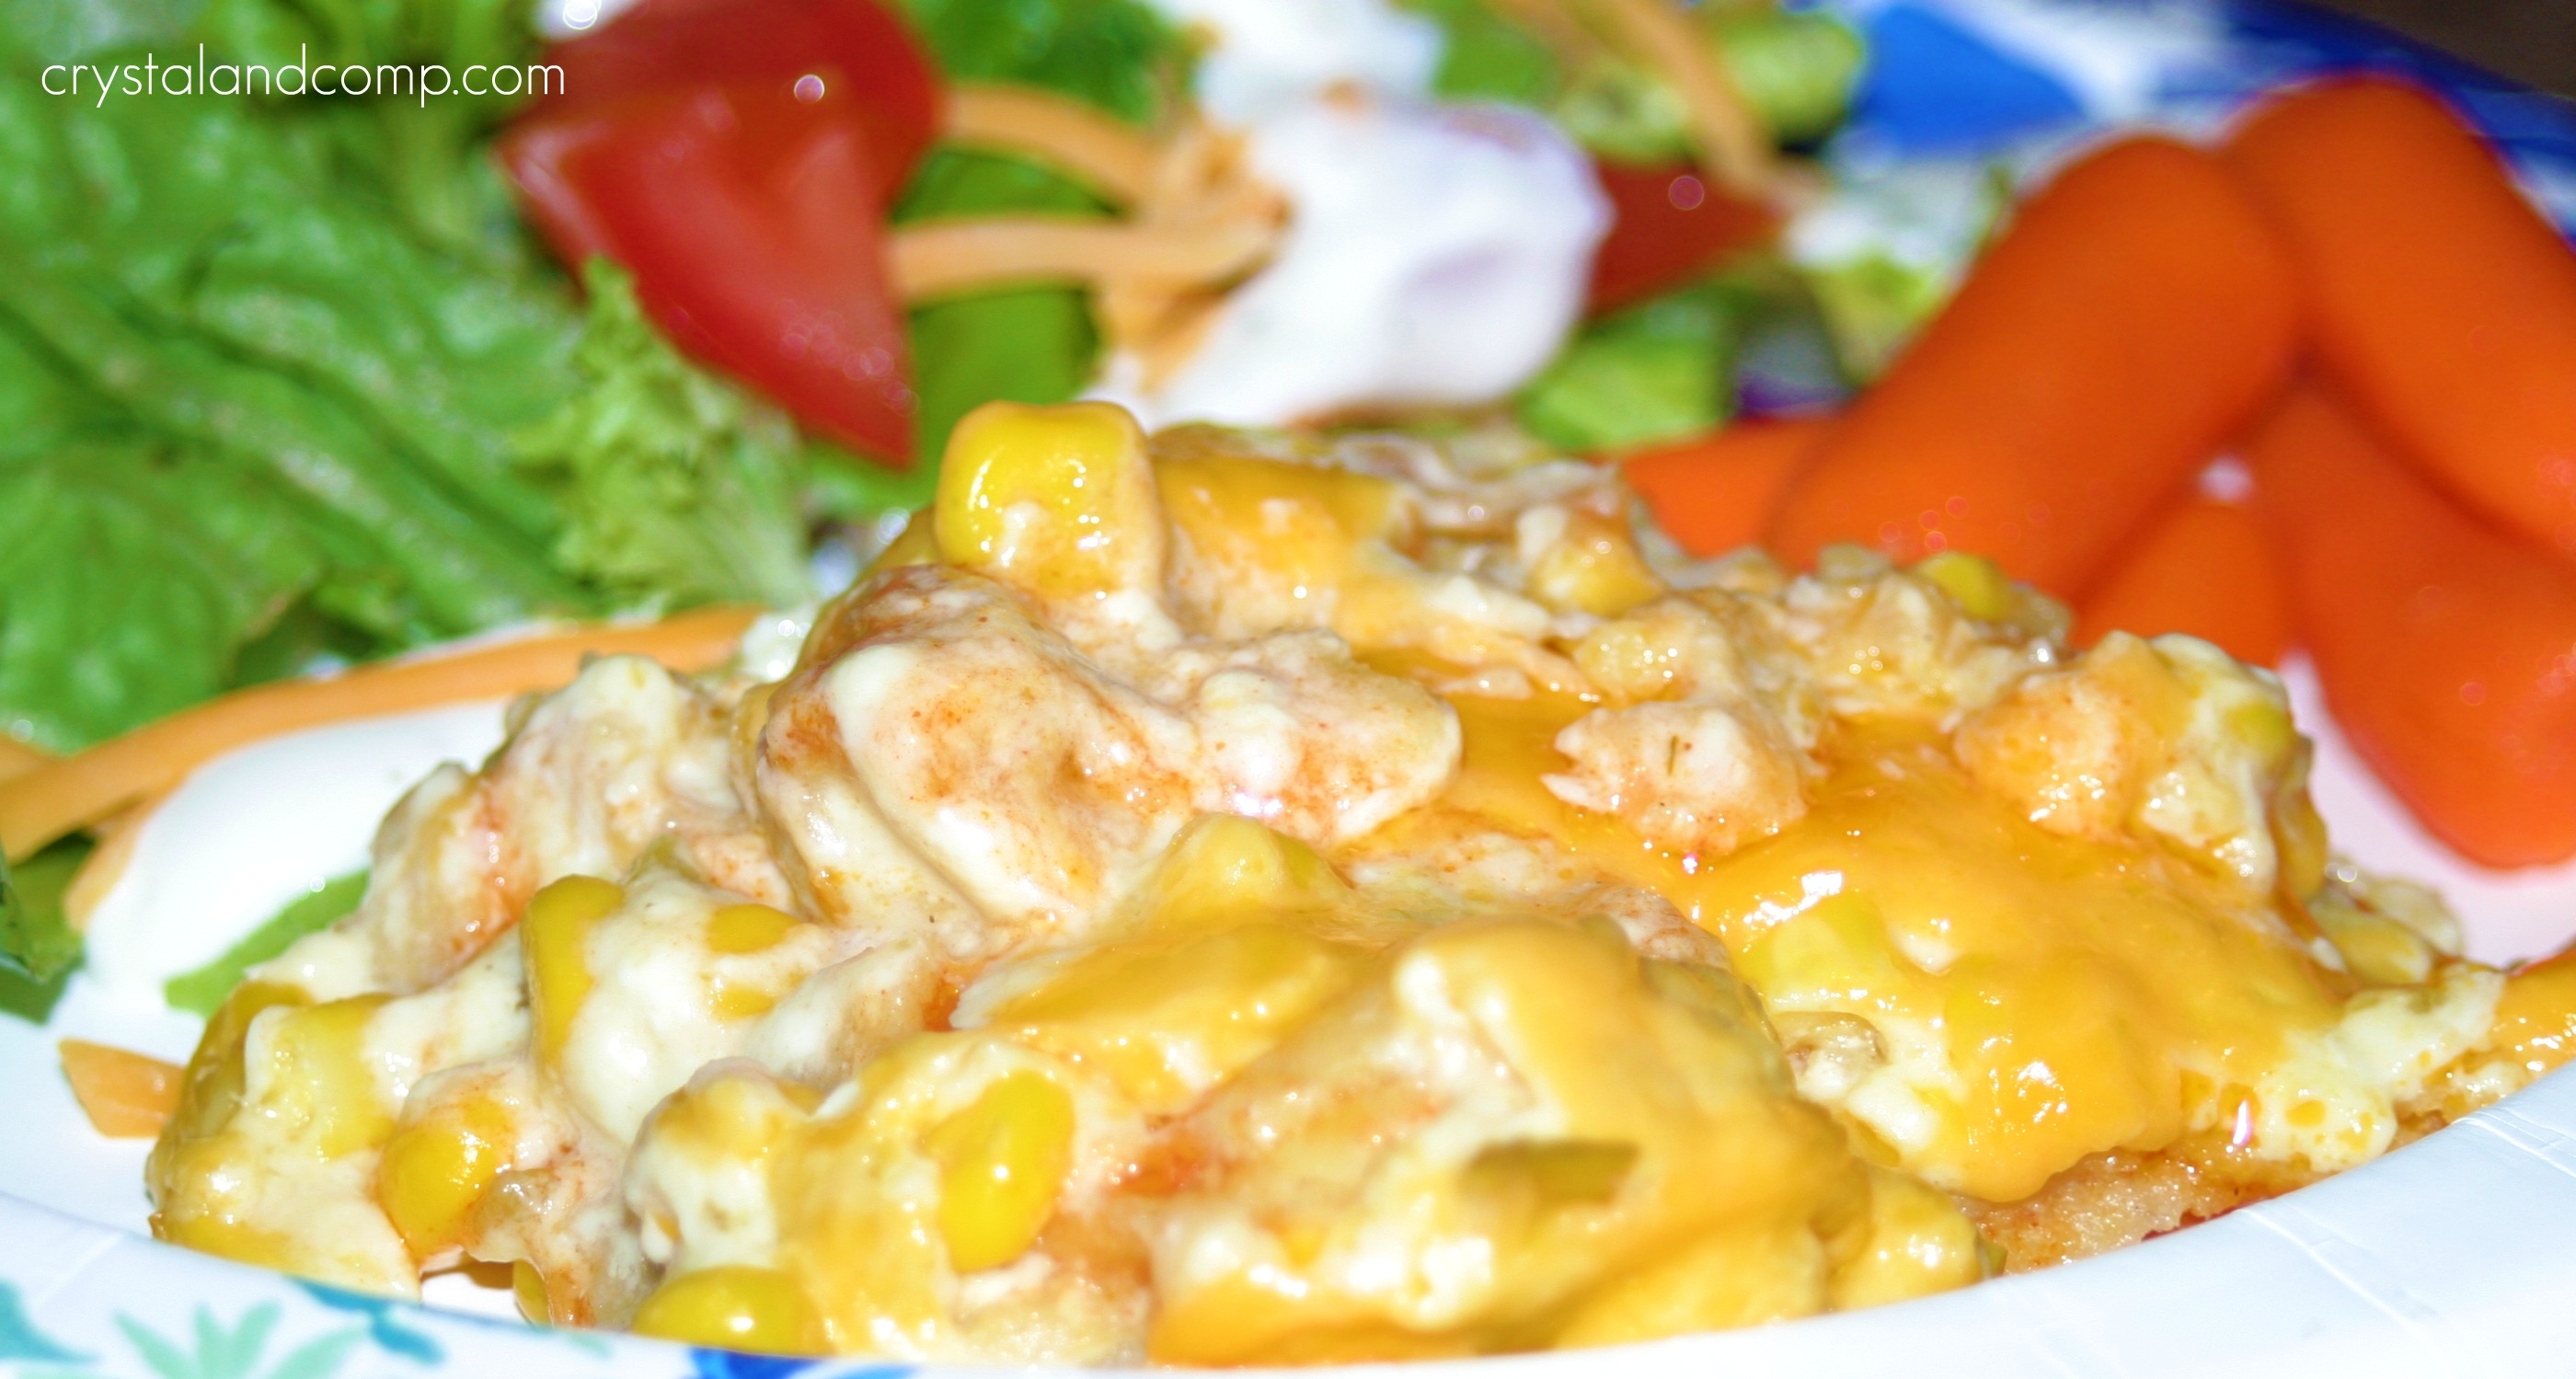 Crock pot chicken recipes easy